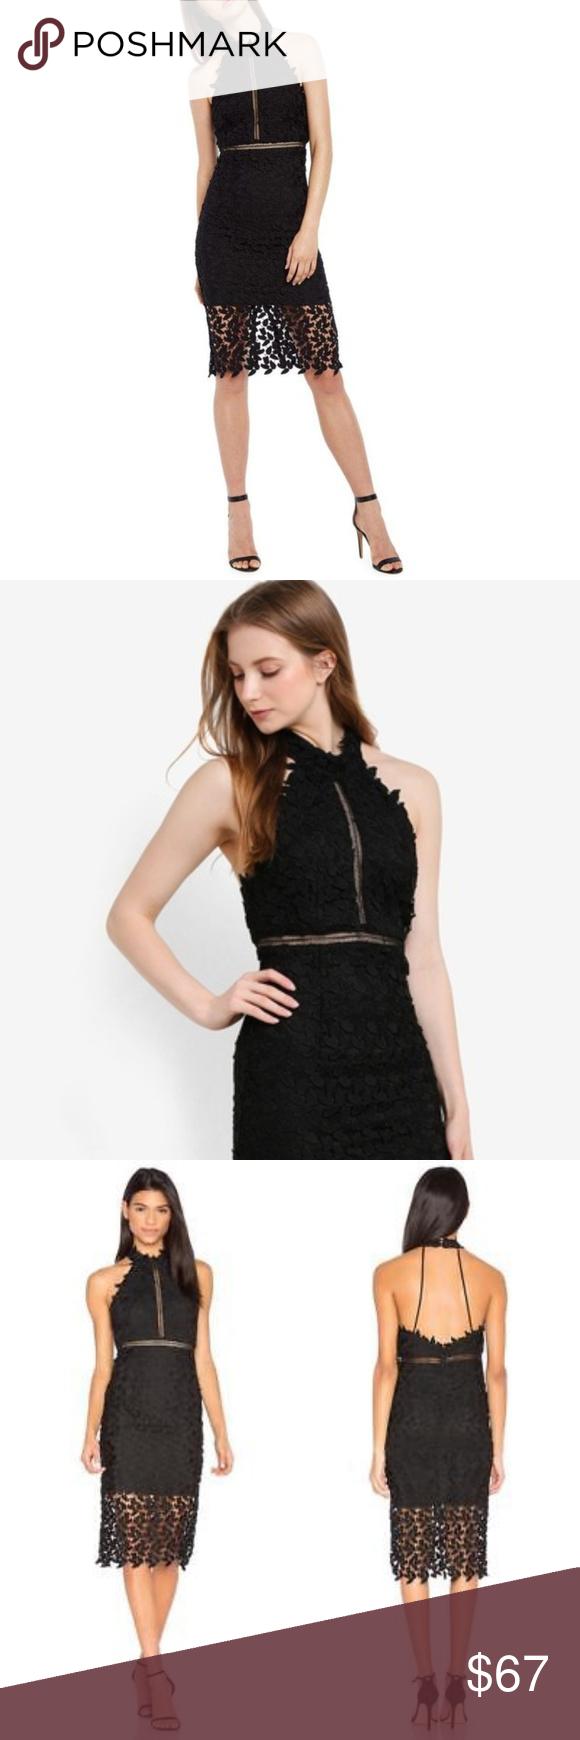 Bardot Gemma Halter Lace Sheath Dress Black Size 6 Bardot